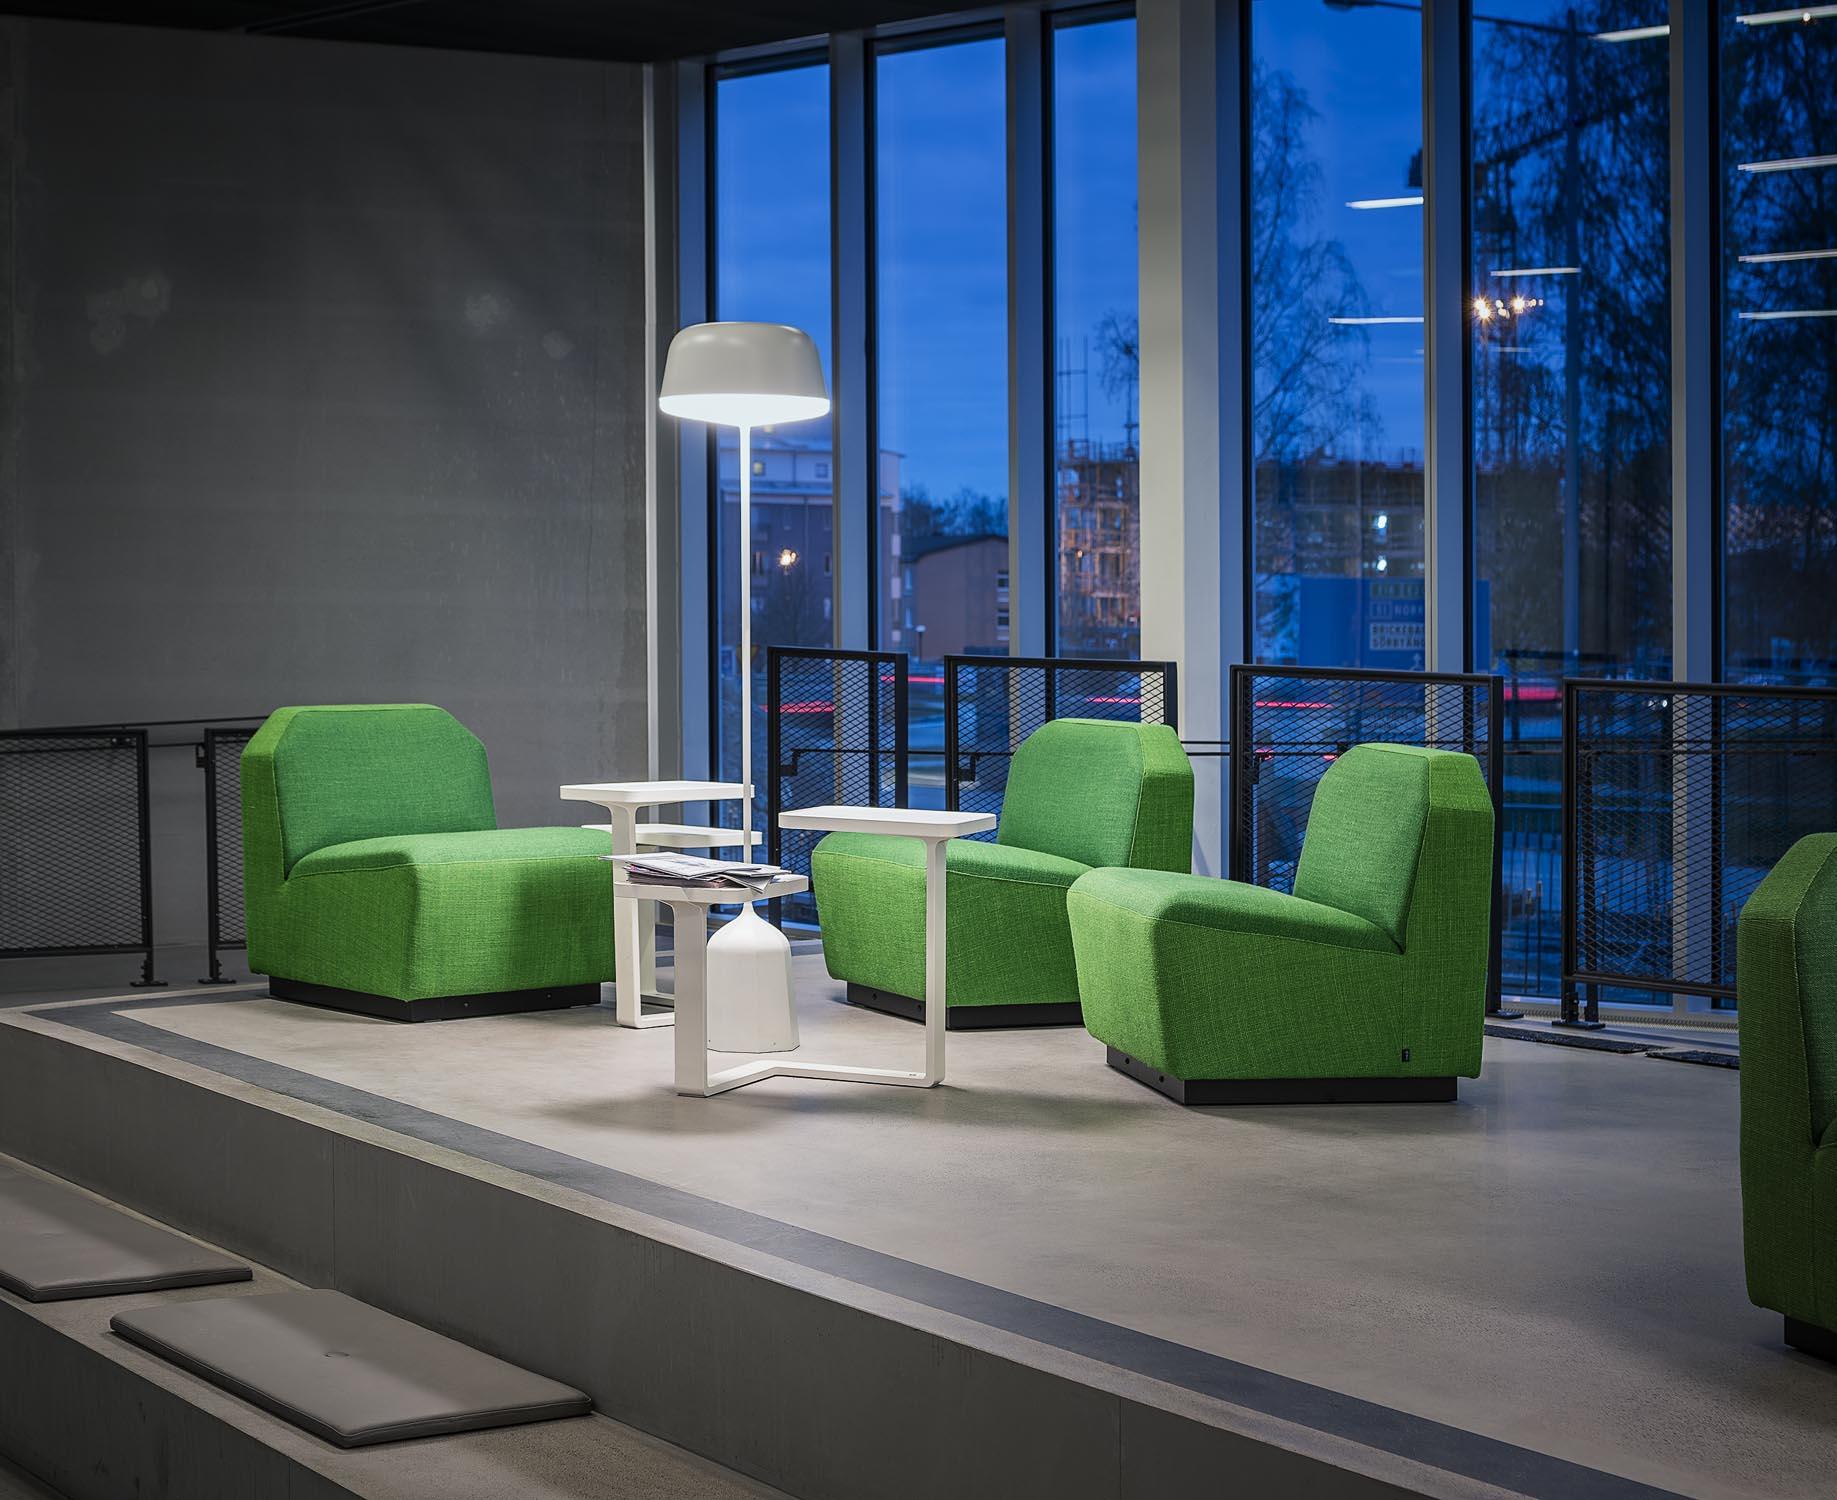 Cumulus - Handelshögskolan Örebro 4